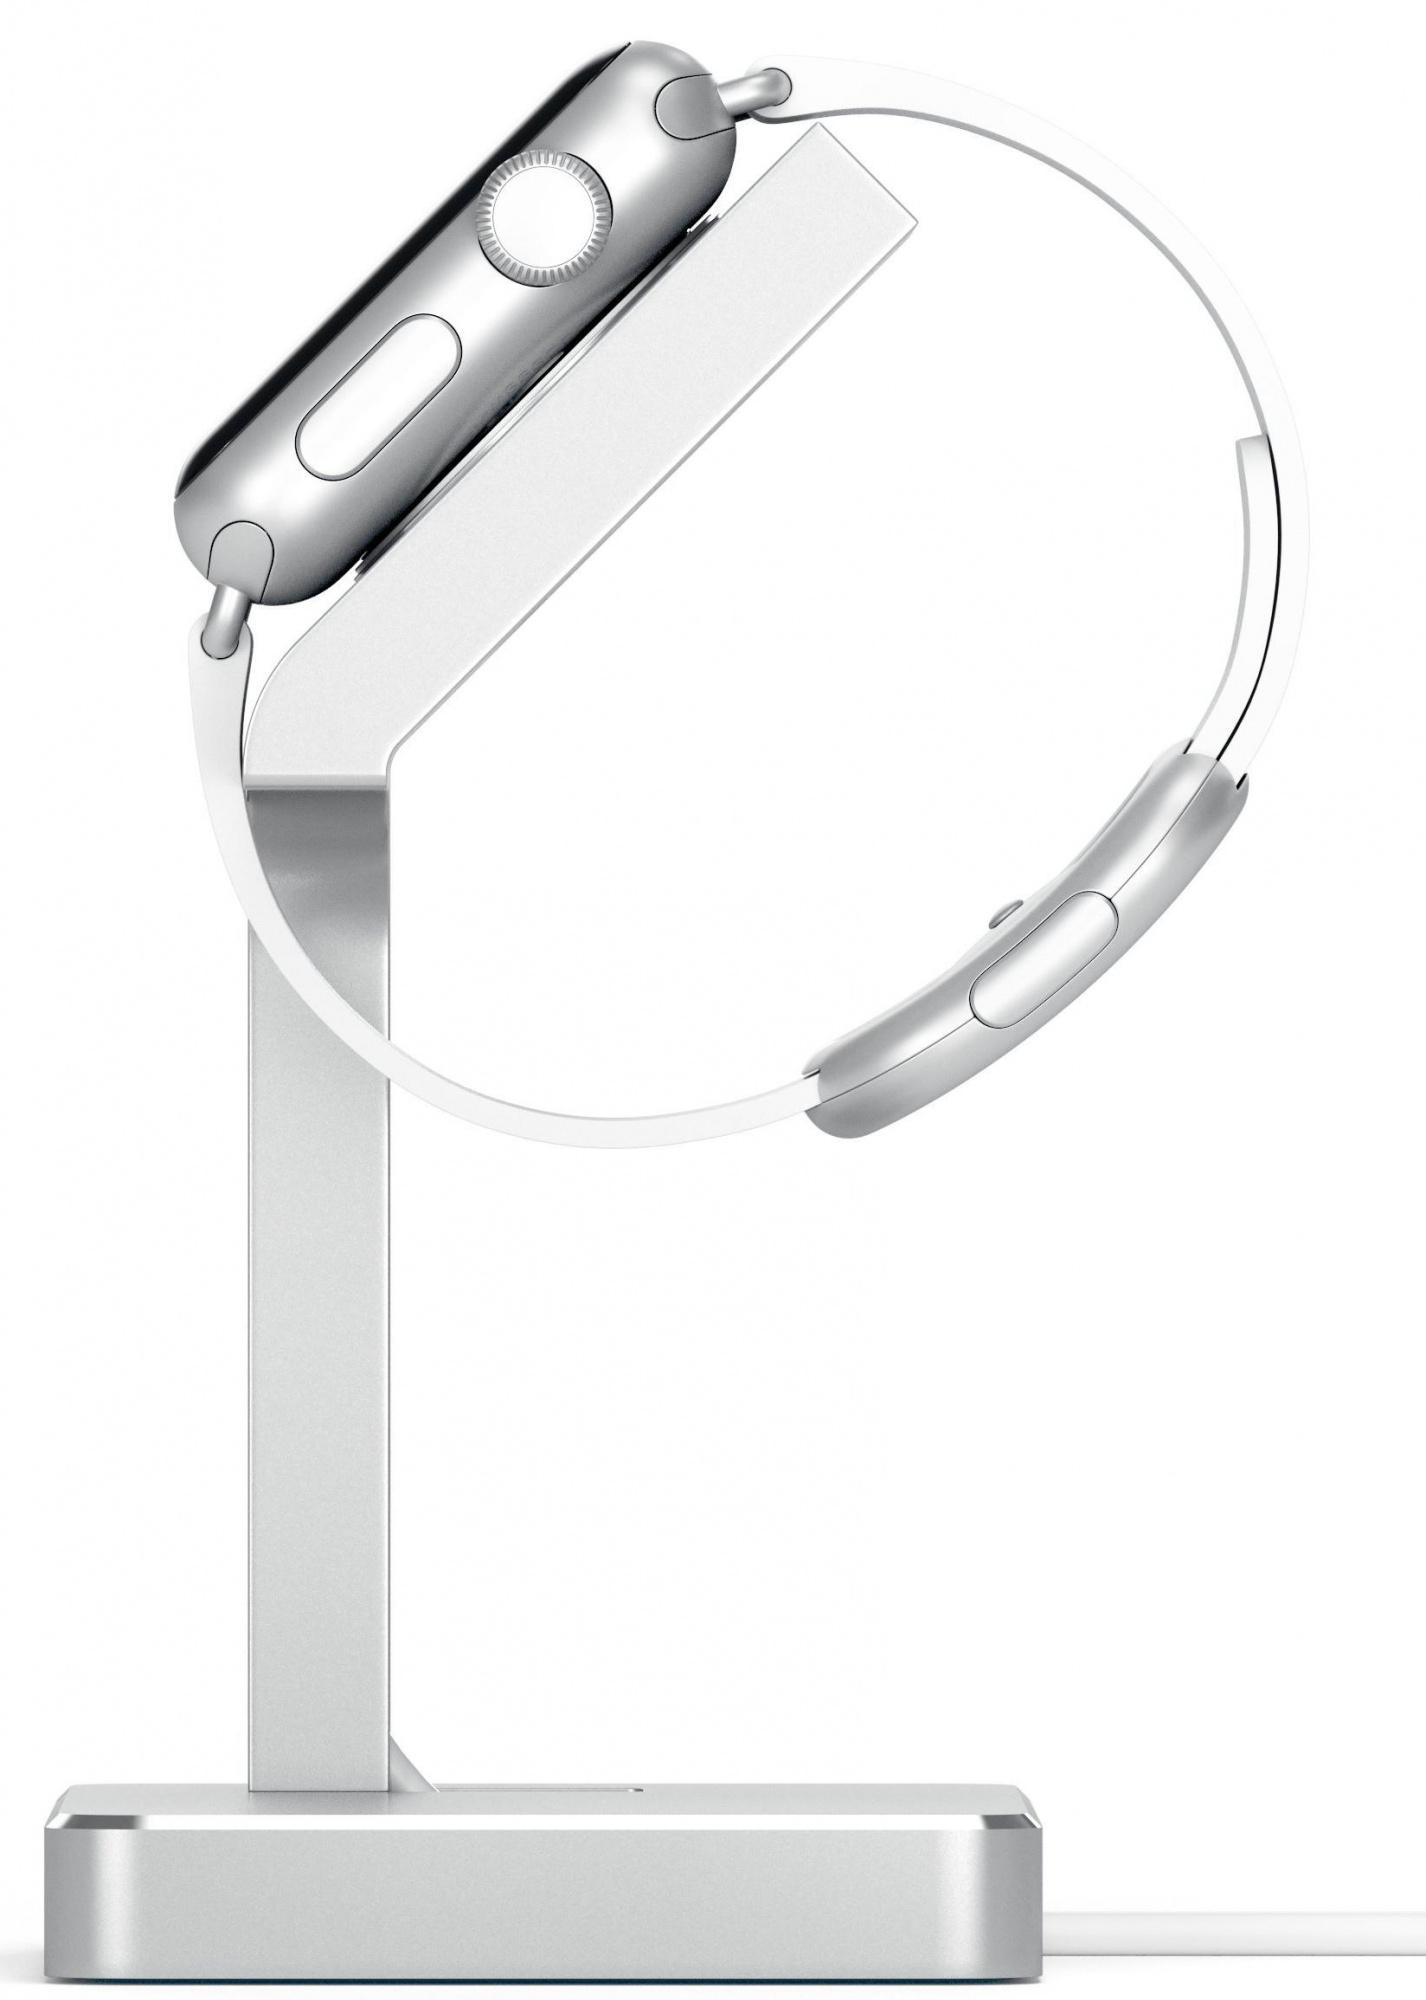 Подставка Satechi Aluminum Apple Watch Charging Stand (ST-AWSS) для Apple Watch/Series 2/3 38/42mm (Silver)